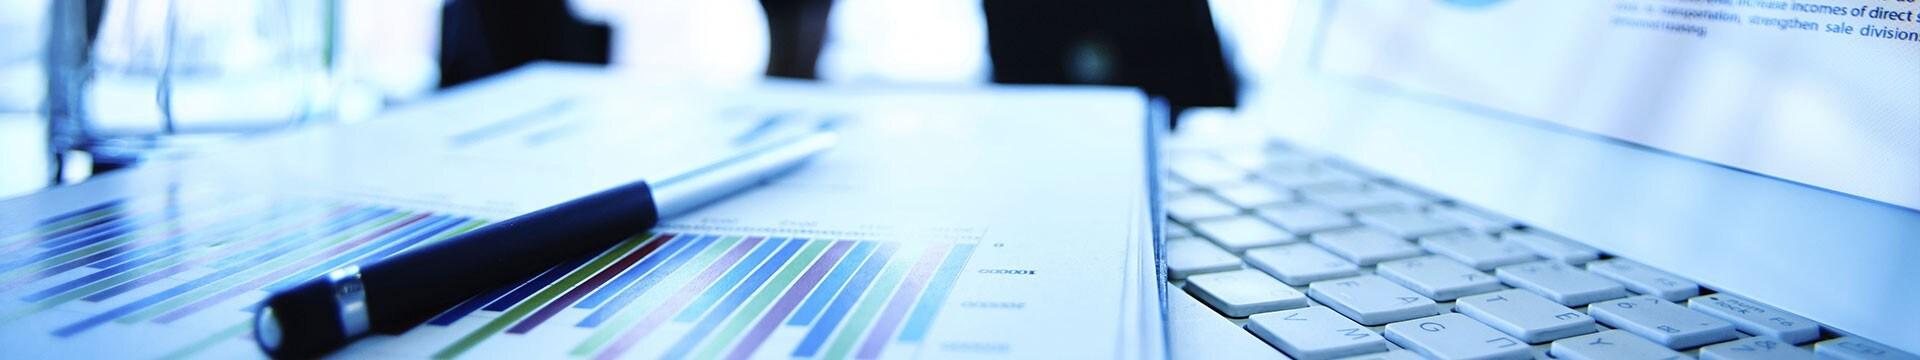 business-information-laptop-financial-document-d